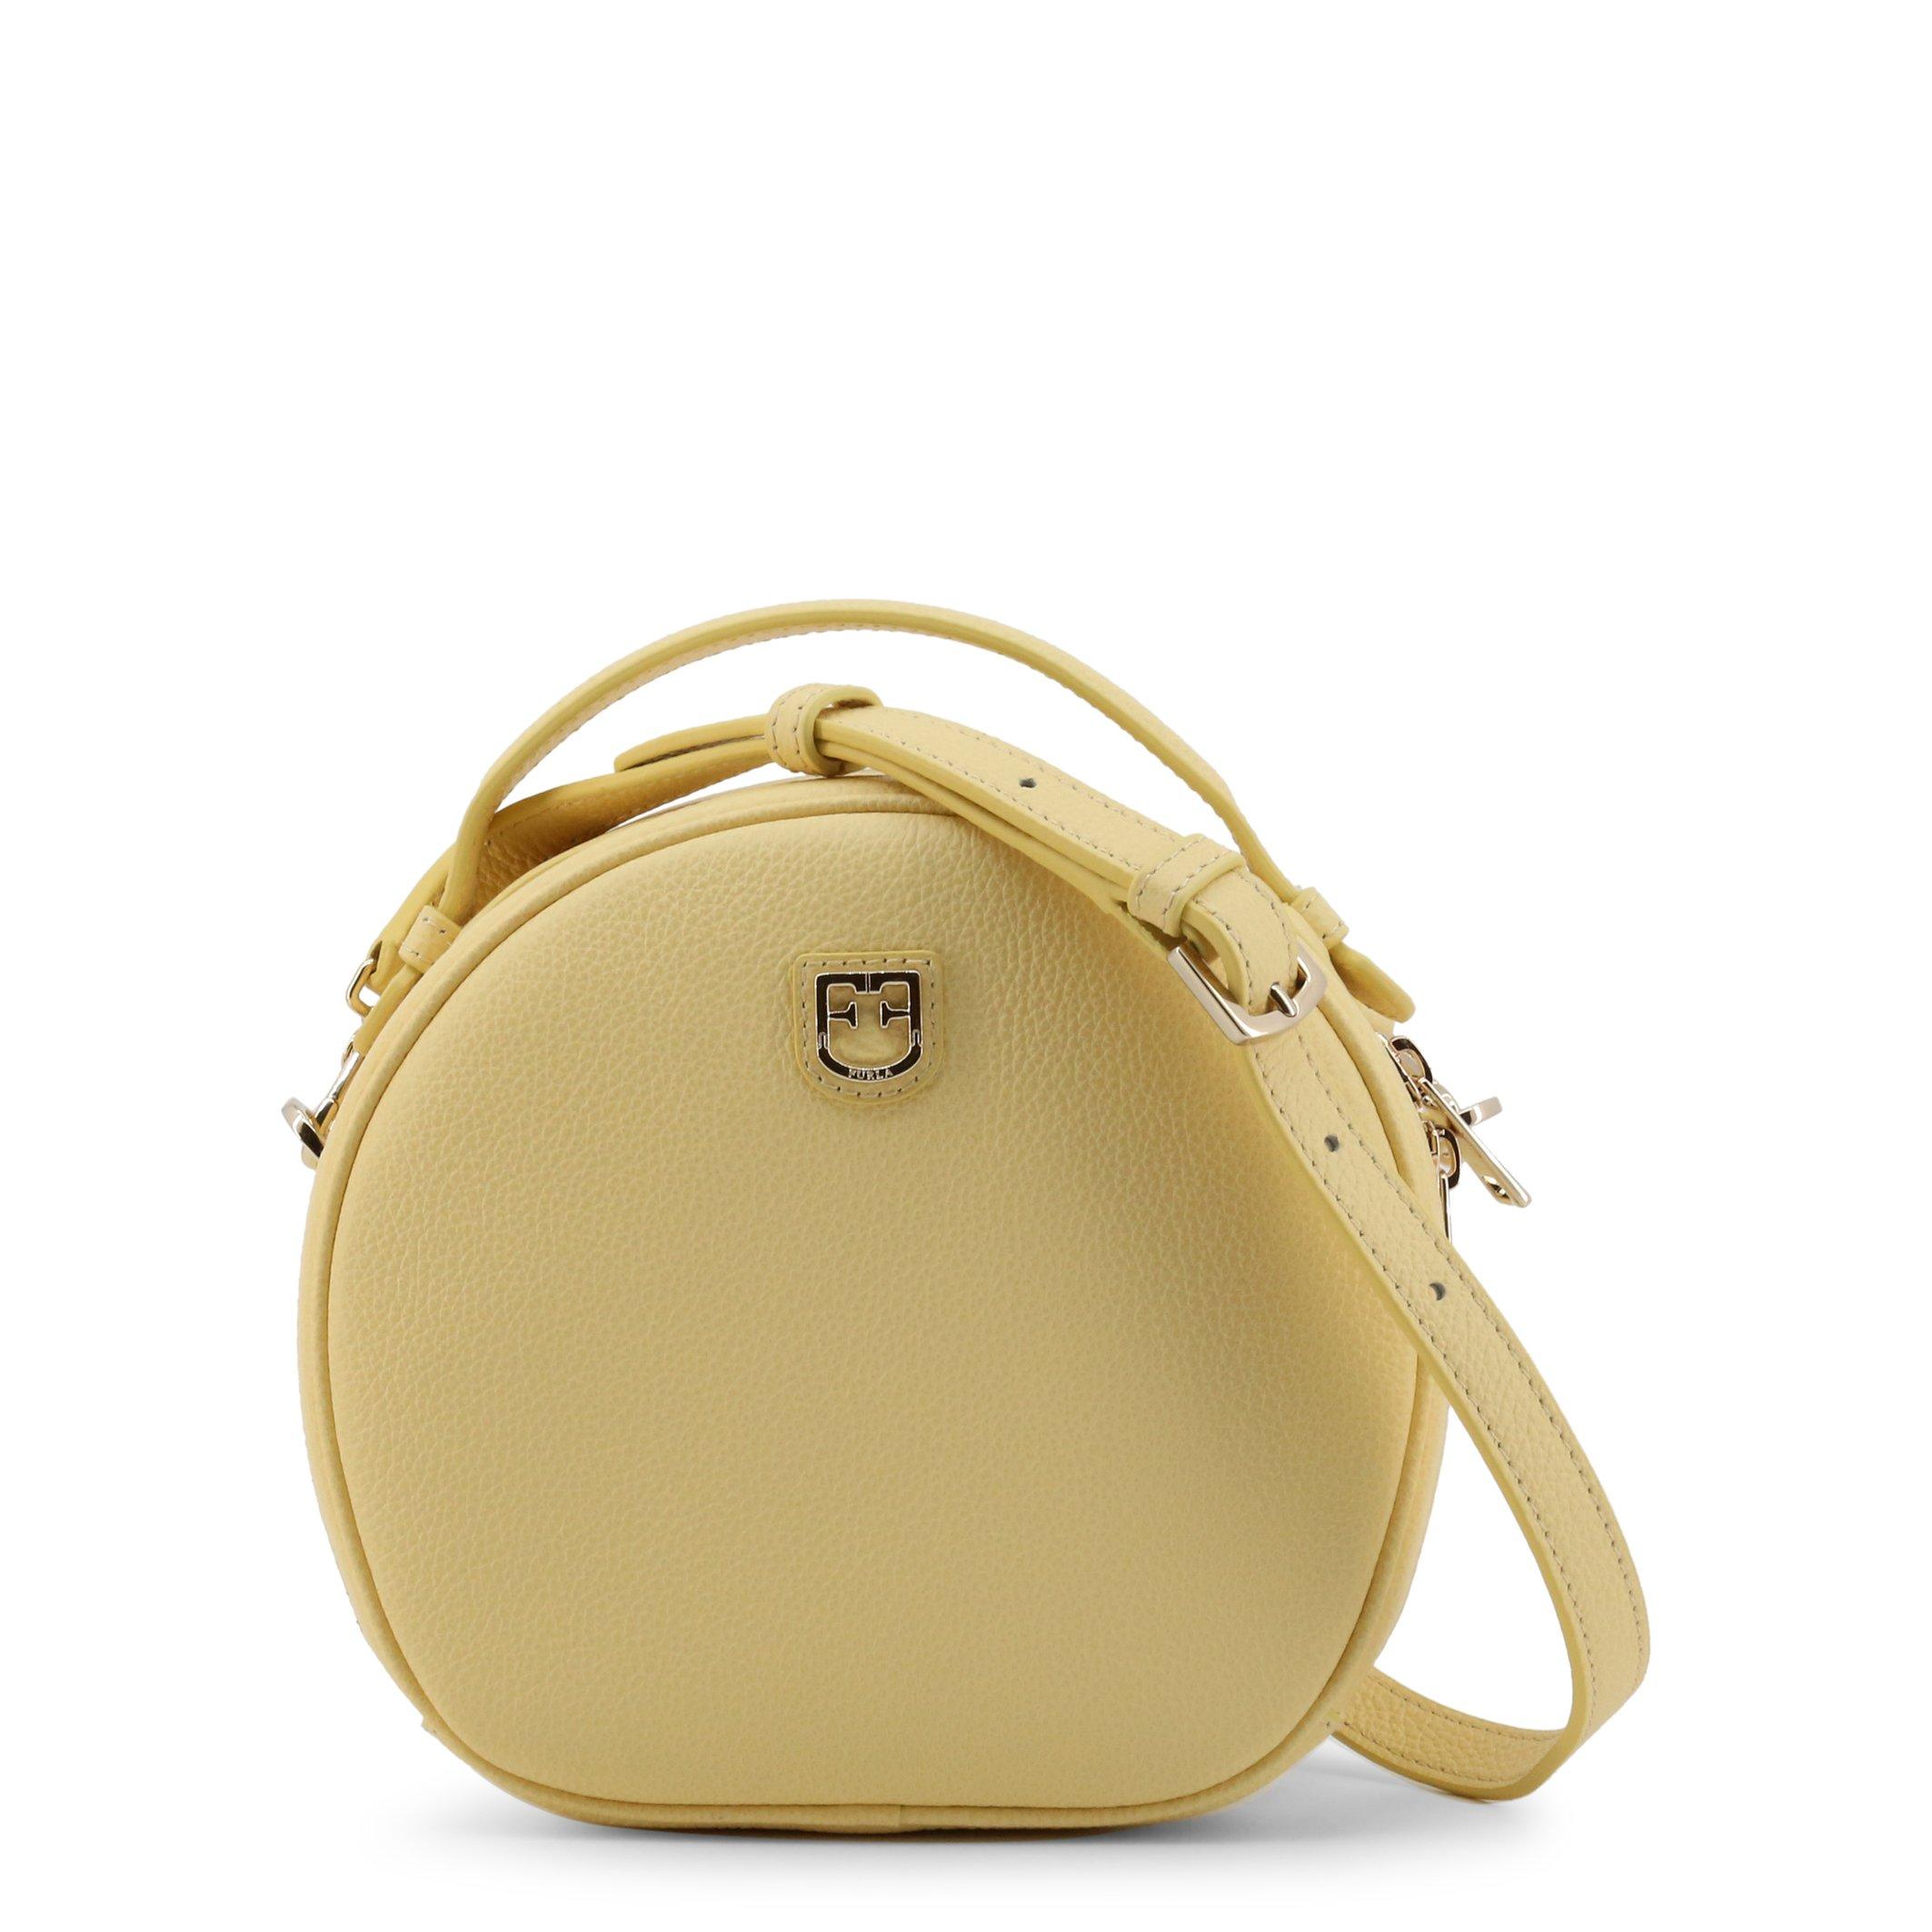 Furla Women's Handbag Various Colours DOTTY_WB00107 - yellow NOSIZE